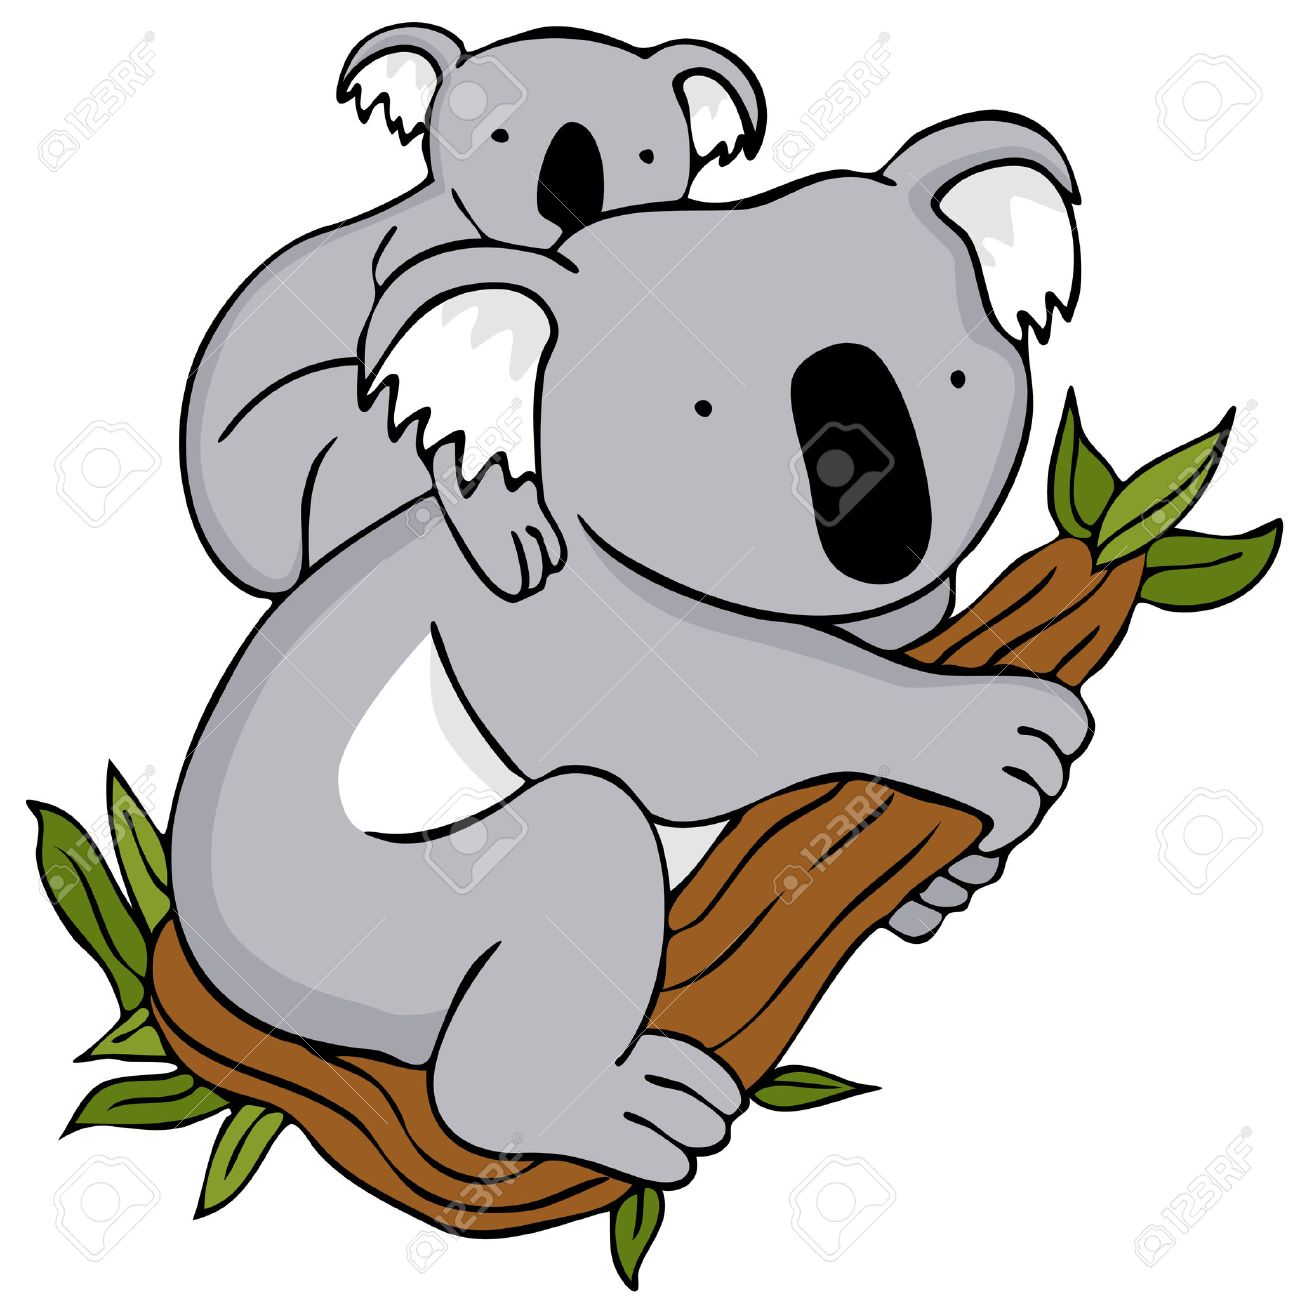 An Image Of A Koala Baby And Mom Cartoon Drawing Royalty Free